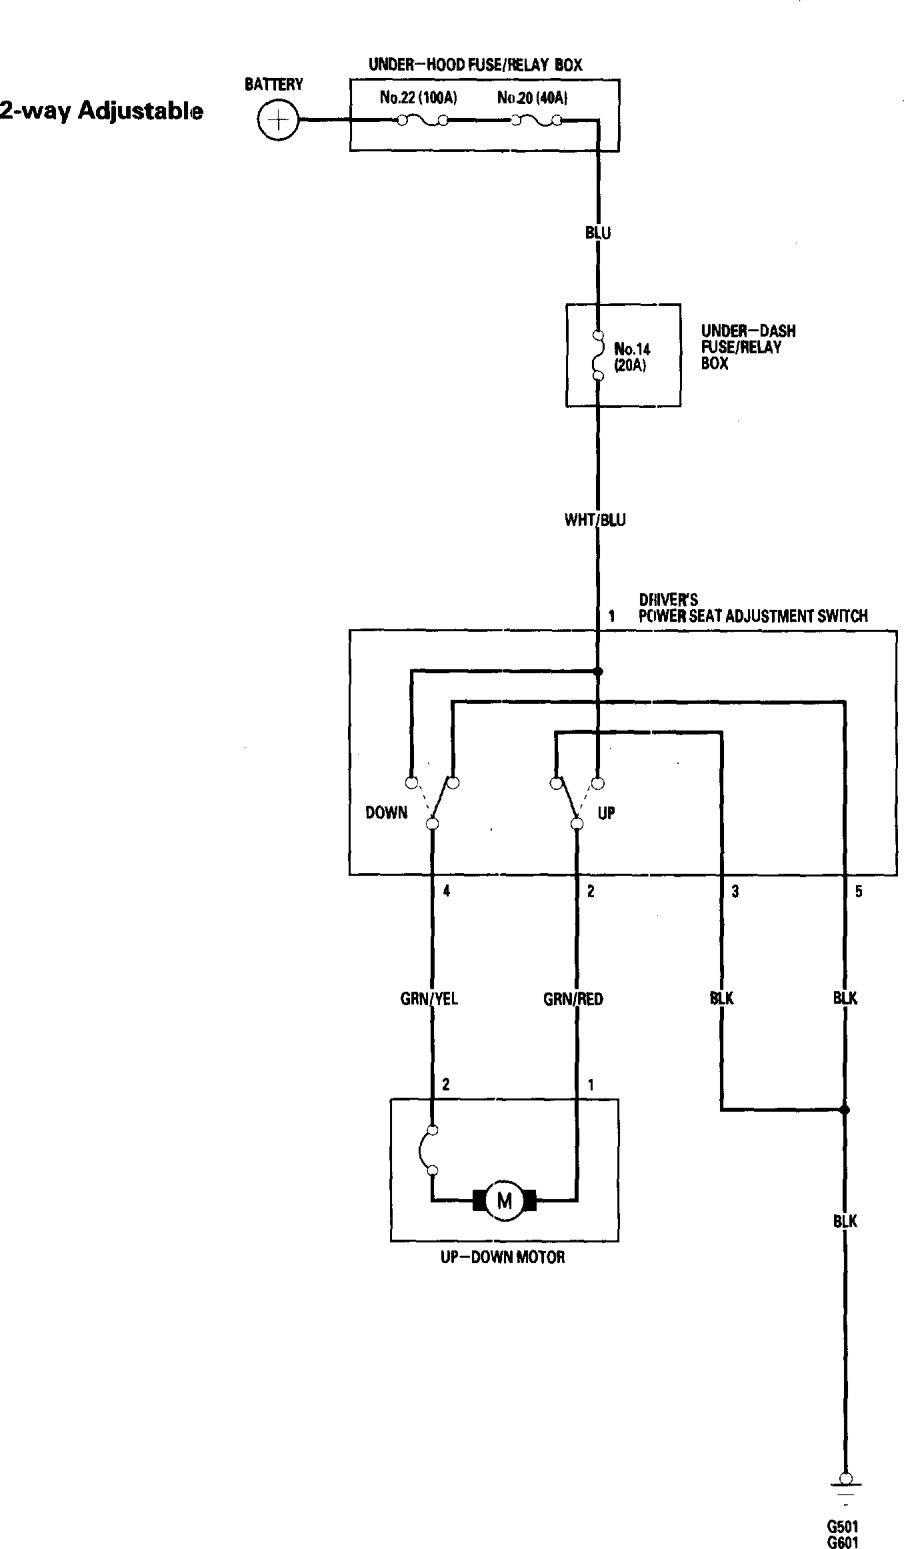 2012 Honda Accord Key Battery : honda, accord, battery, Honda, Power, Wiring, Diagram, Filter, Fat-cancel, Fat-cancel.cosmoristrutturazioni.it